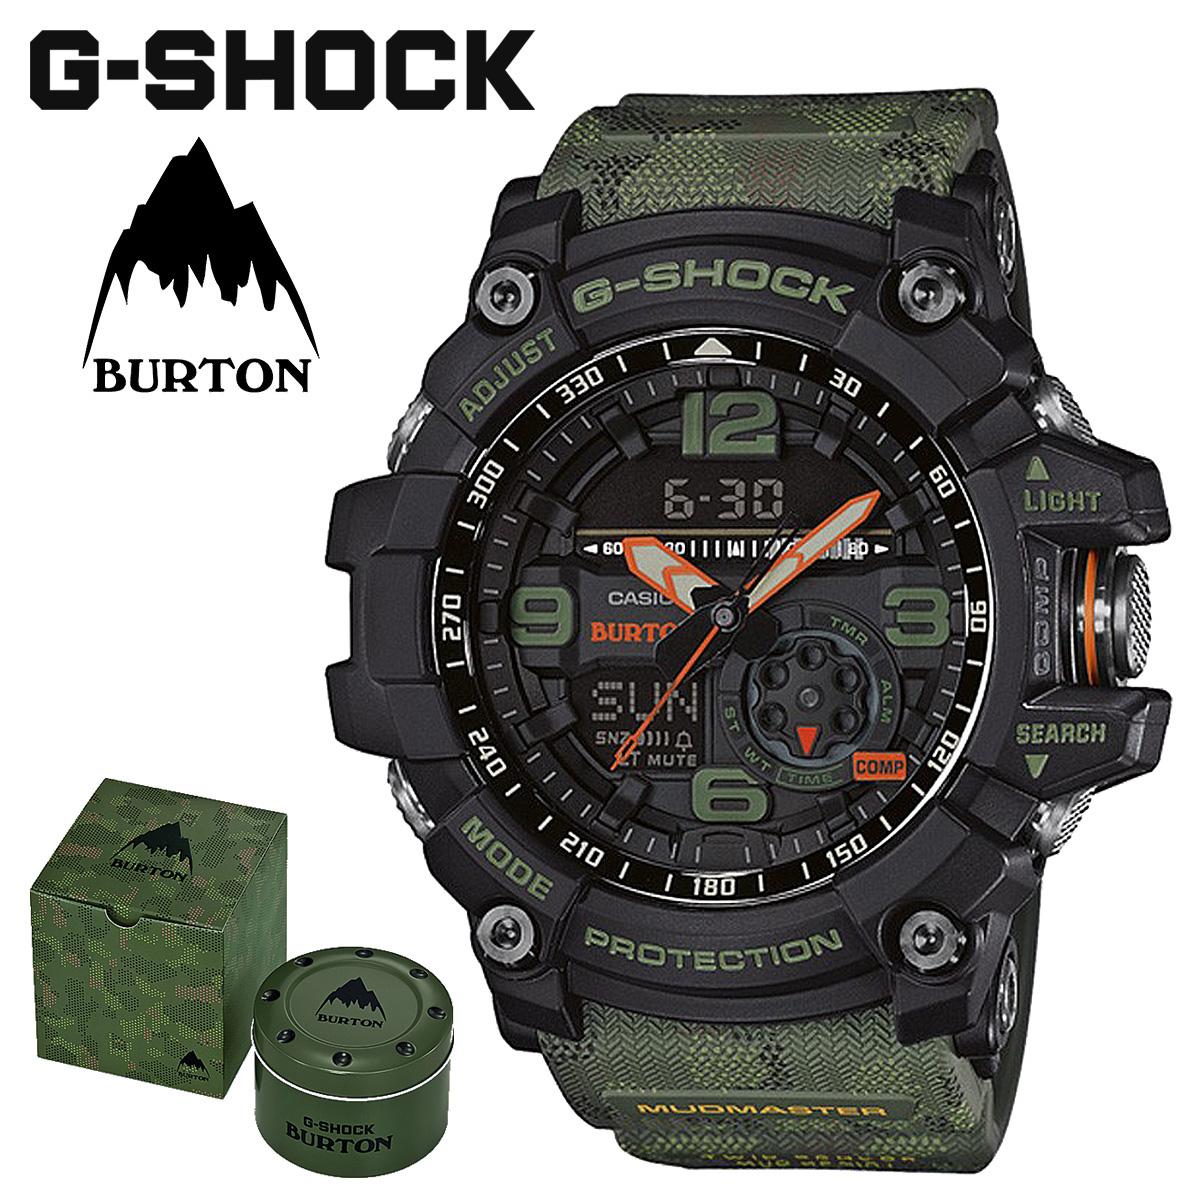 CASIO G-SHOCK MUDMASTER BURTON Casio watch mad master GG-1000BTN-1AJR Colla  Bozzy shock G-Shock G- shock camouflage men gap Dis  3 12 Shinnyu load  a9711dd1f9